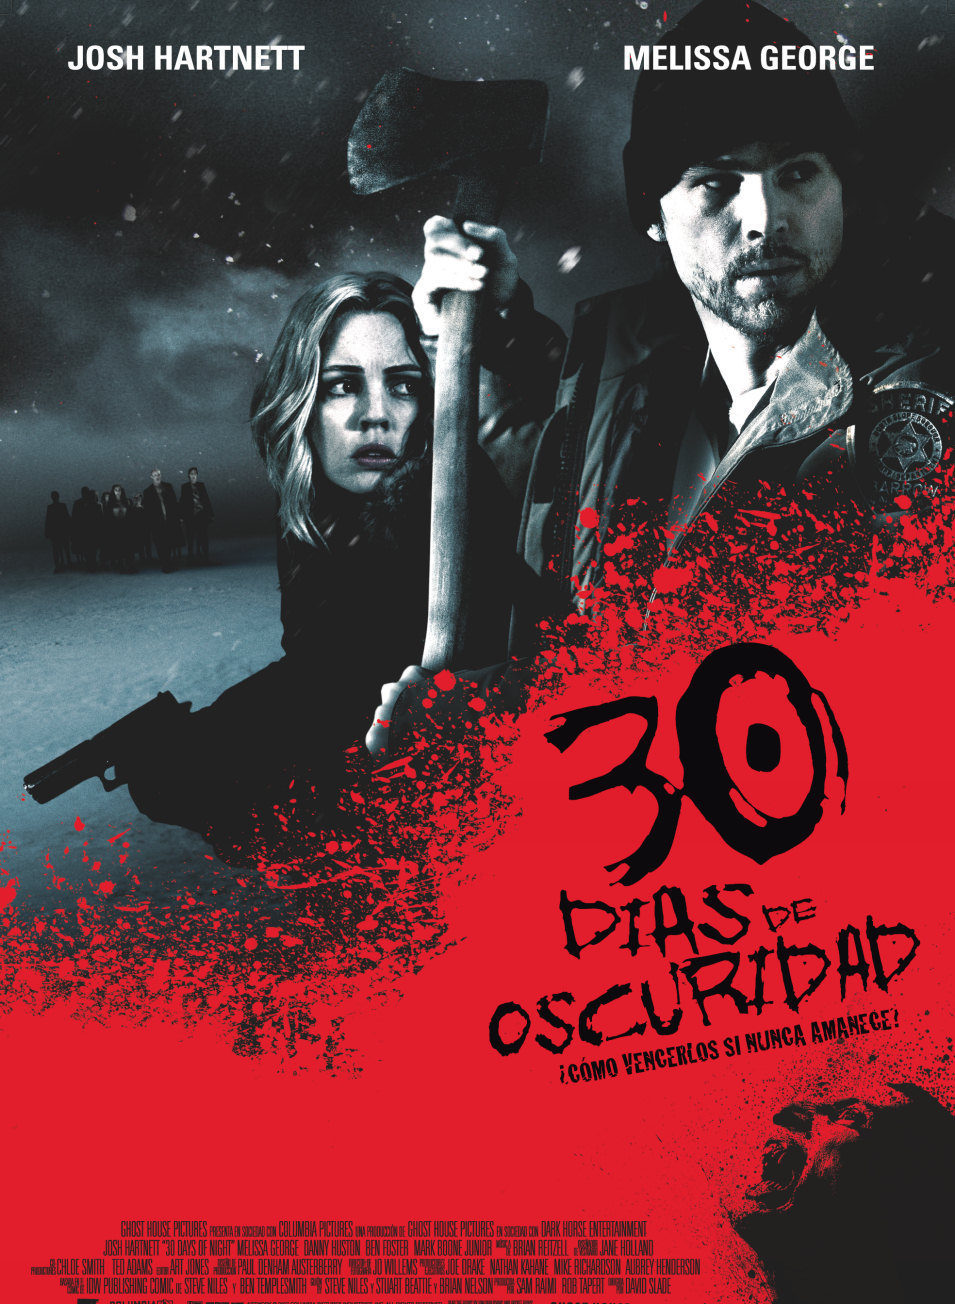 Cartel España de '30 días de oscuridad'